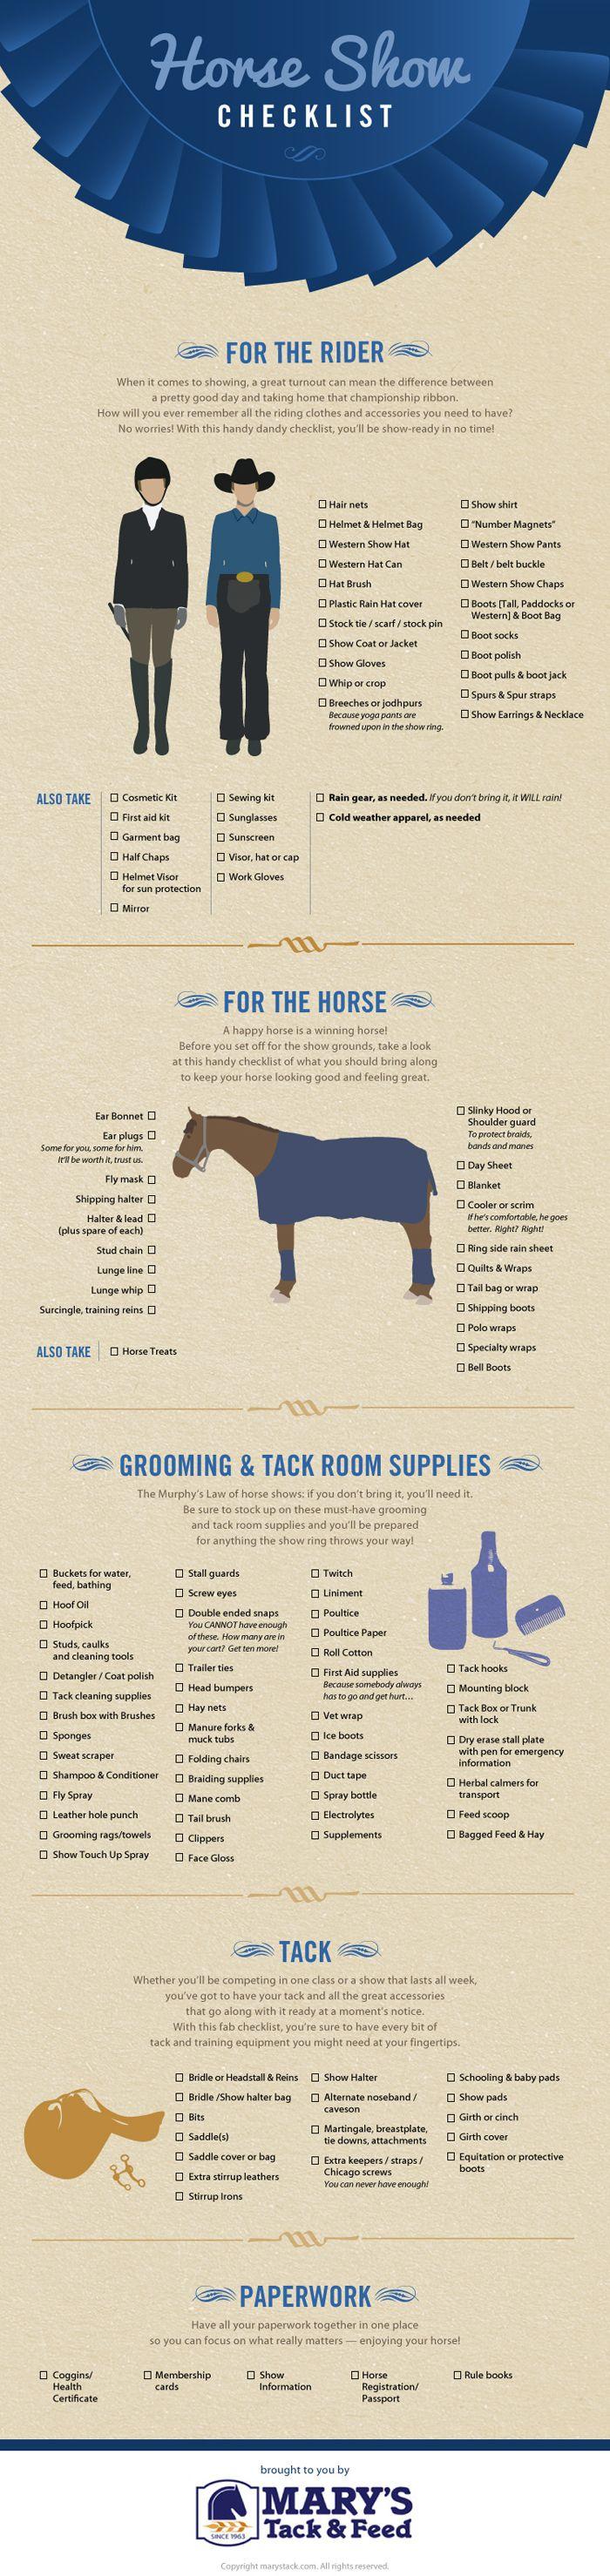 The perfect horse show checklist.